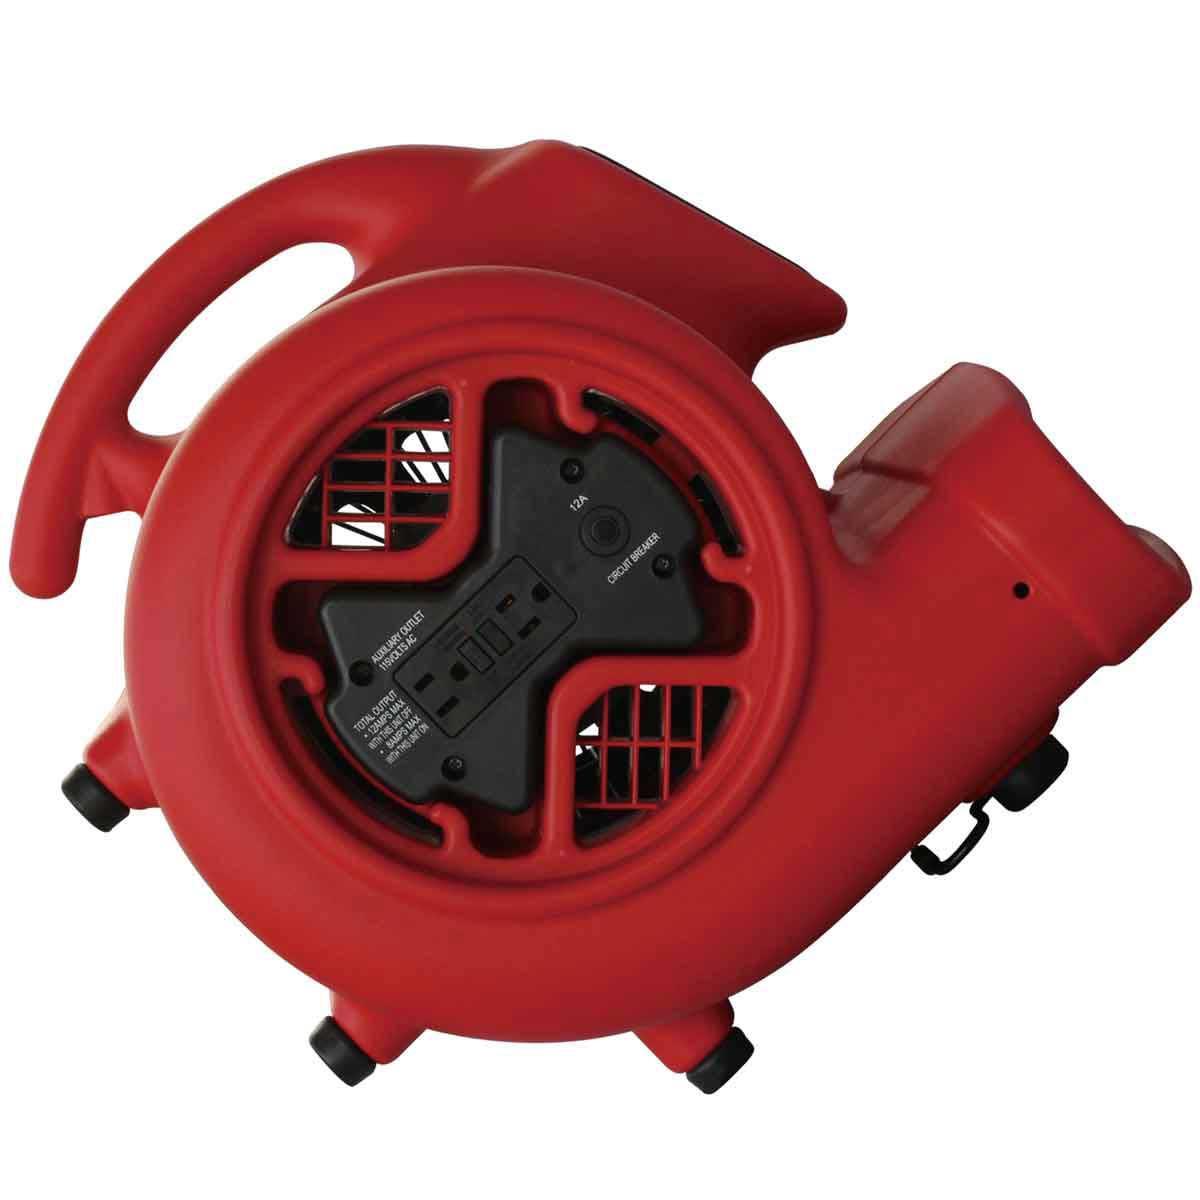 Hawk Air Mover ventilator outlet